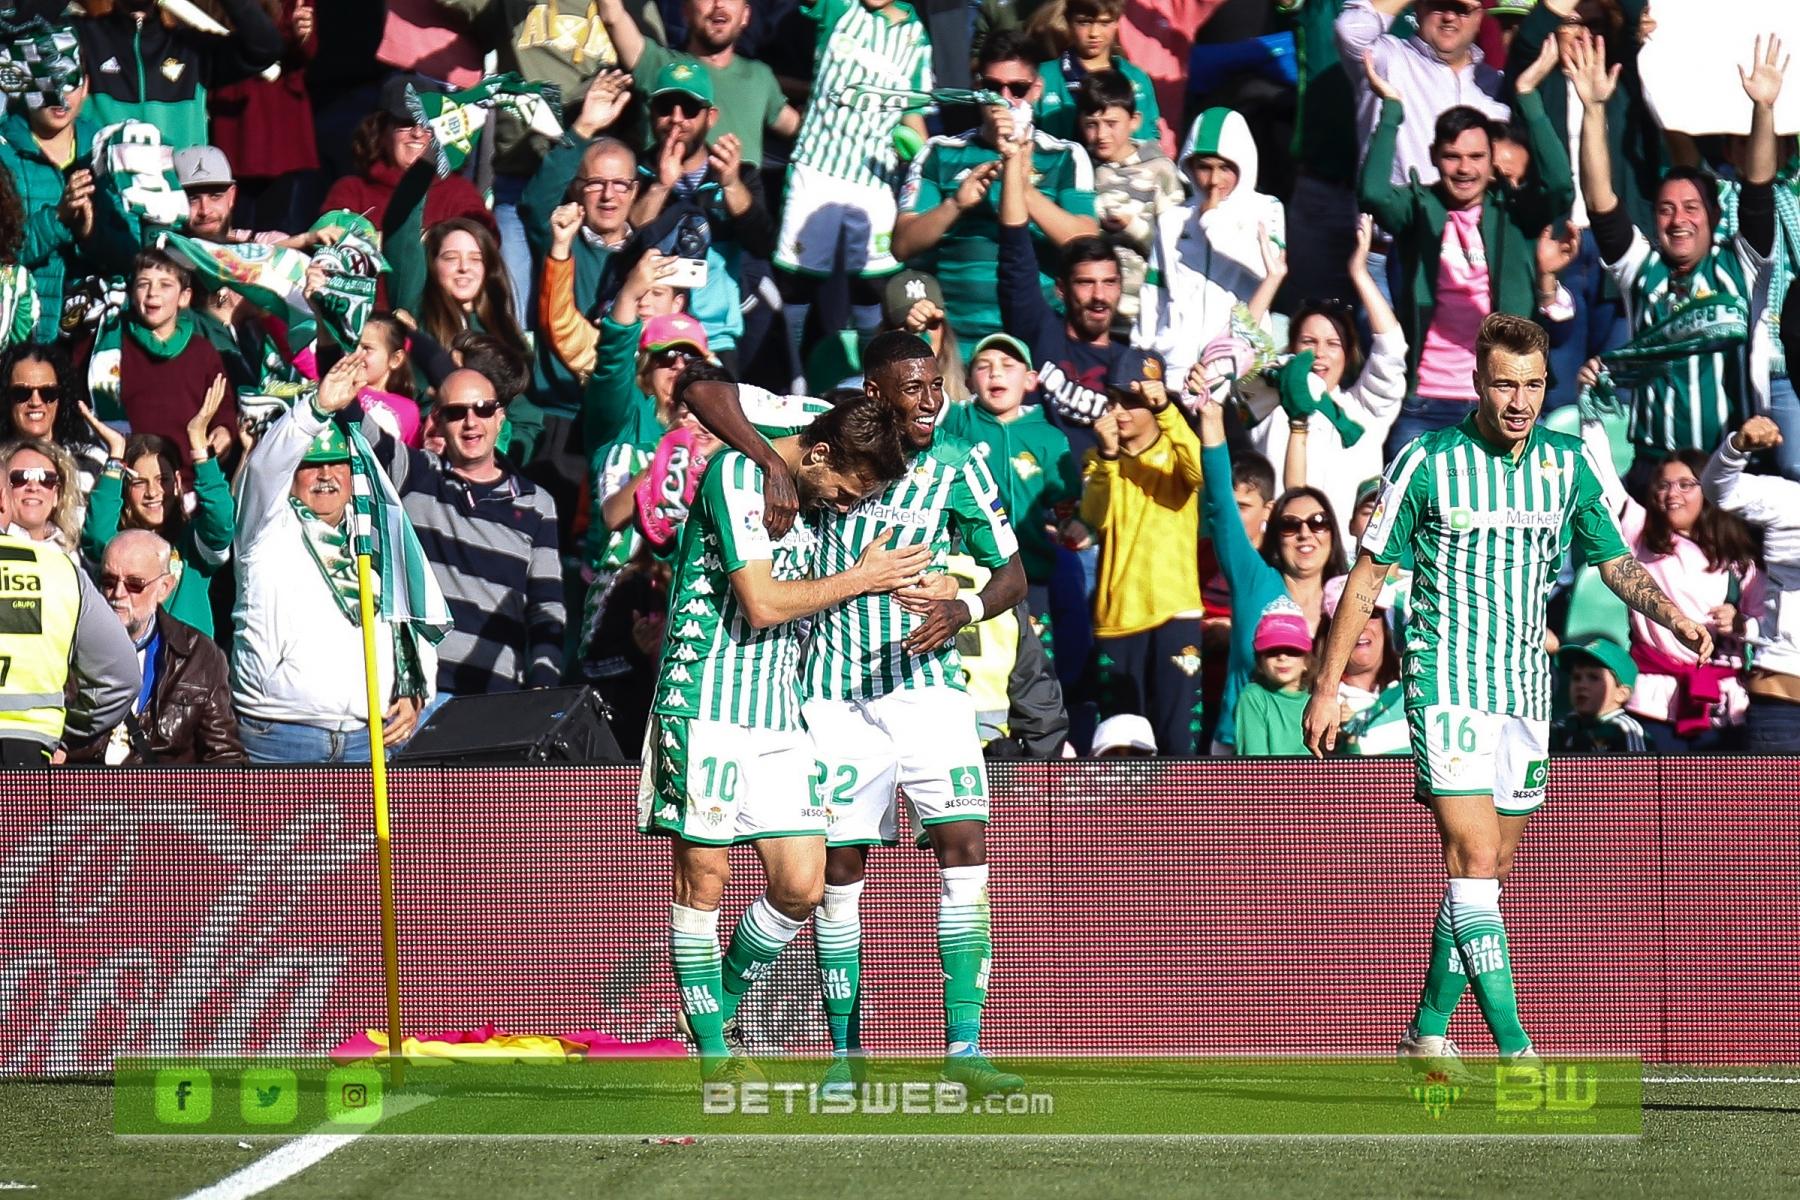 J20 Real Betis - Real Sociedad 47